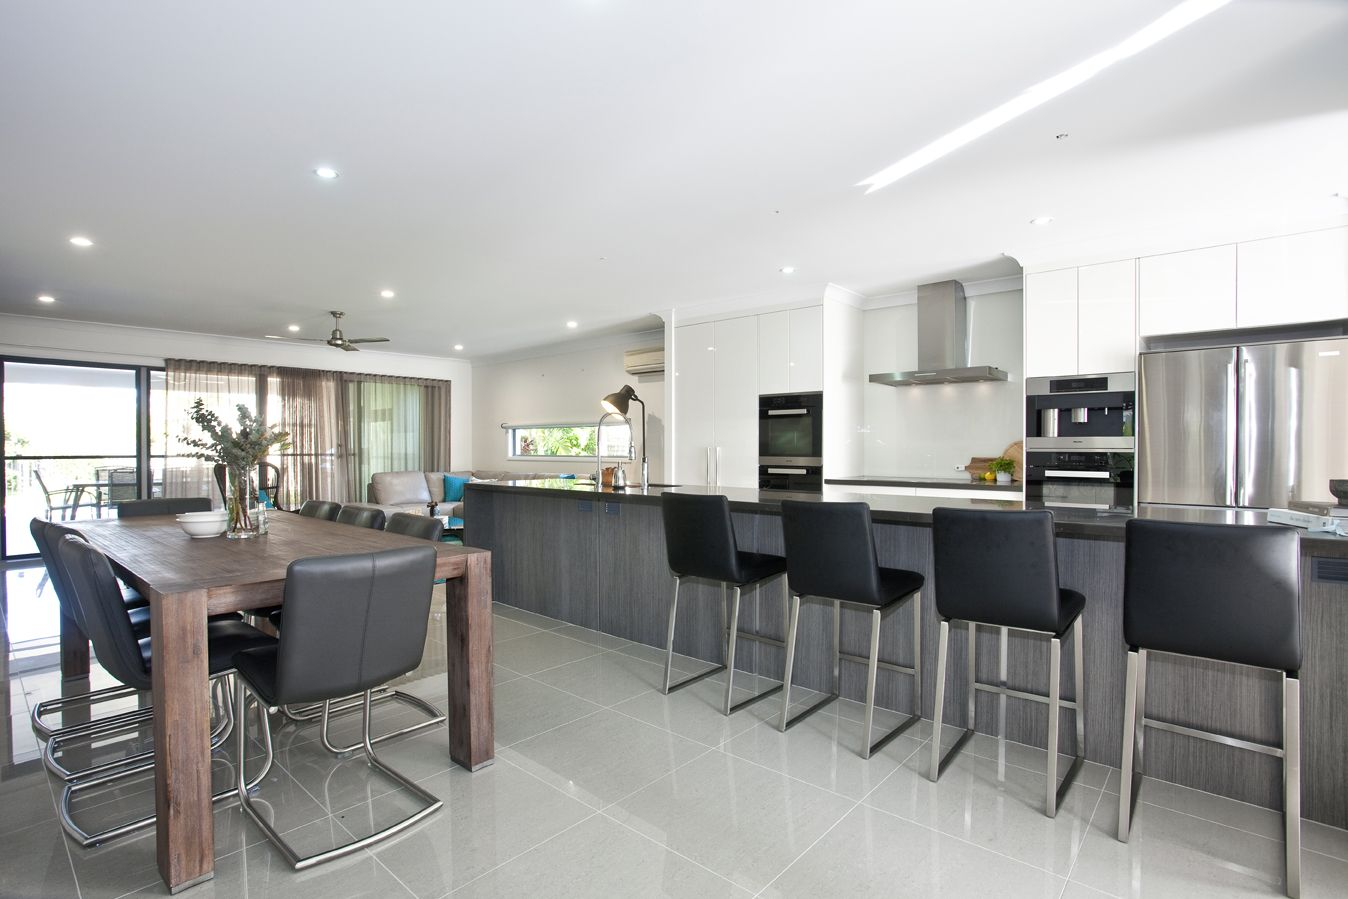 Gloss Matt Wood Kitchen Finishes: High Gloss 2 Pac Finish To Kitchen In Dulux Natural White